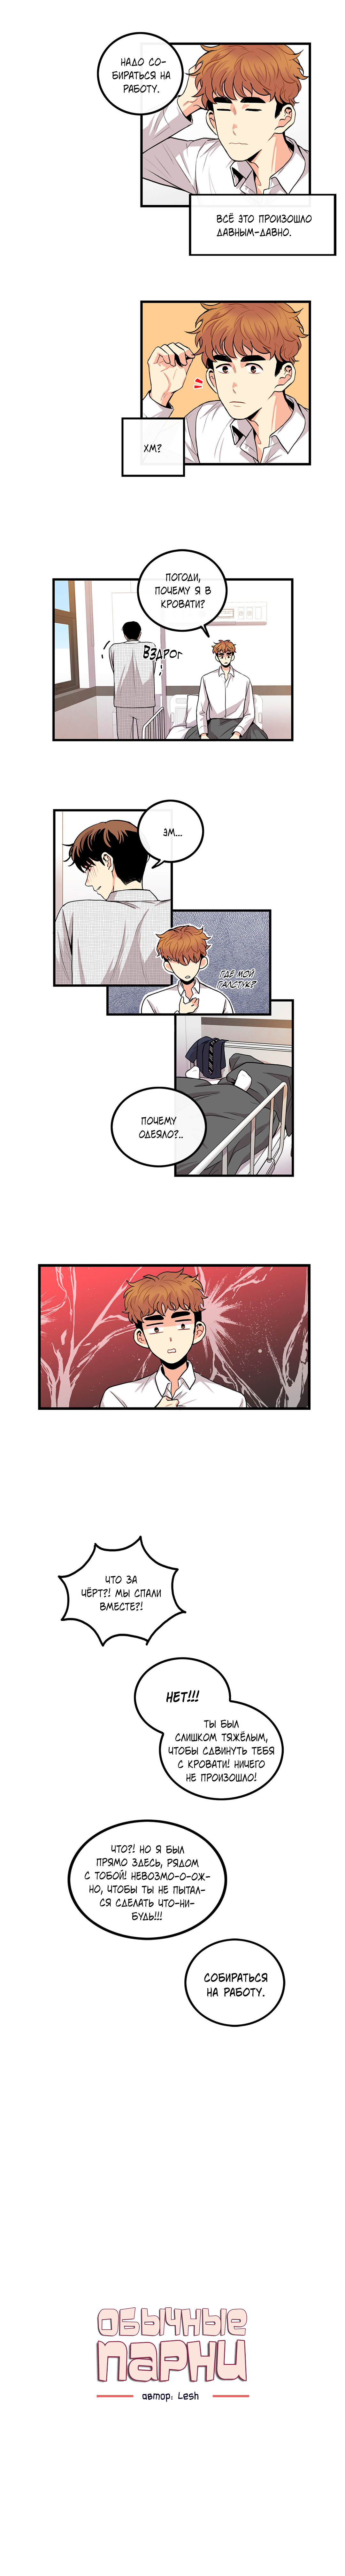 https://r1.ninemanga.com/comics/pic2/57/32441/409599/151928425659.jpg Page 9